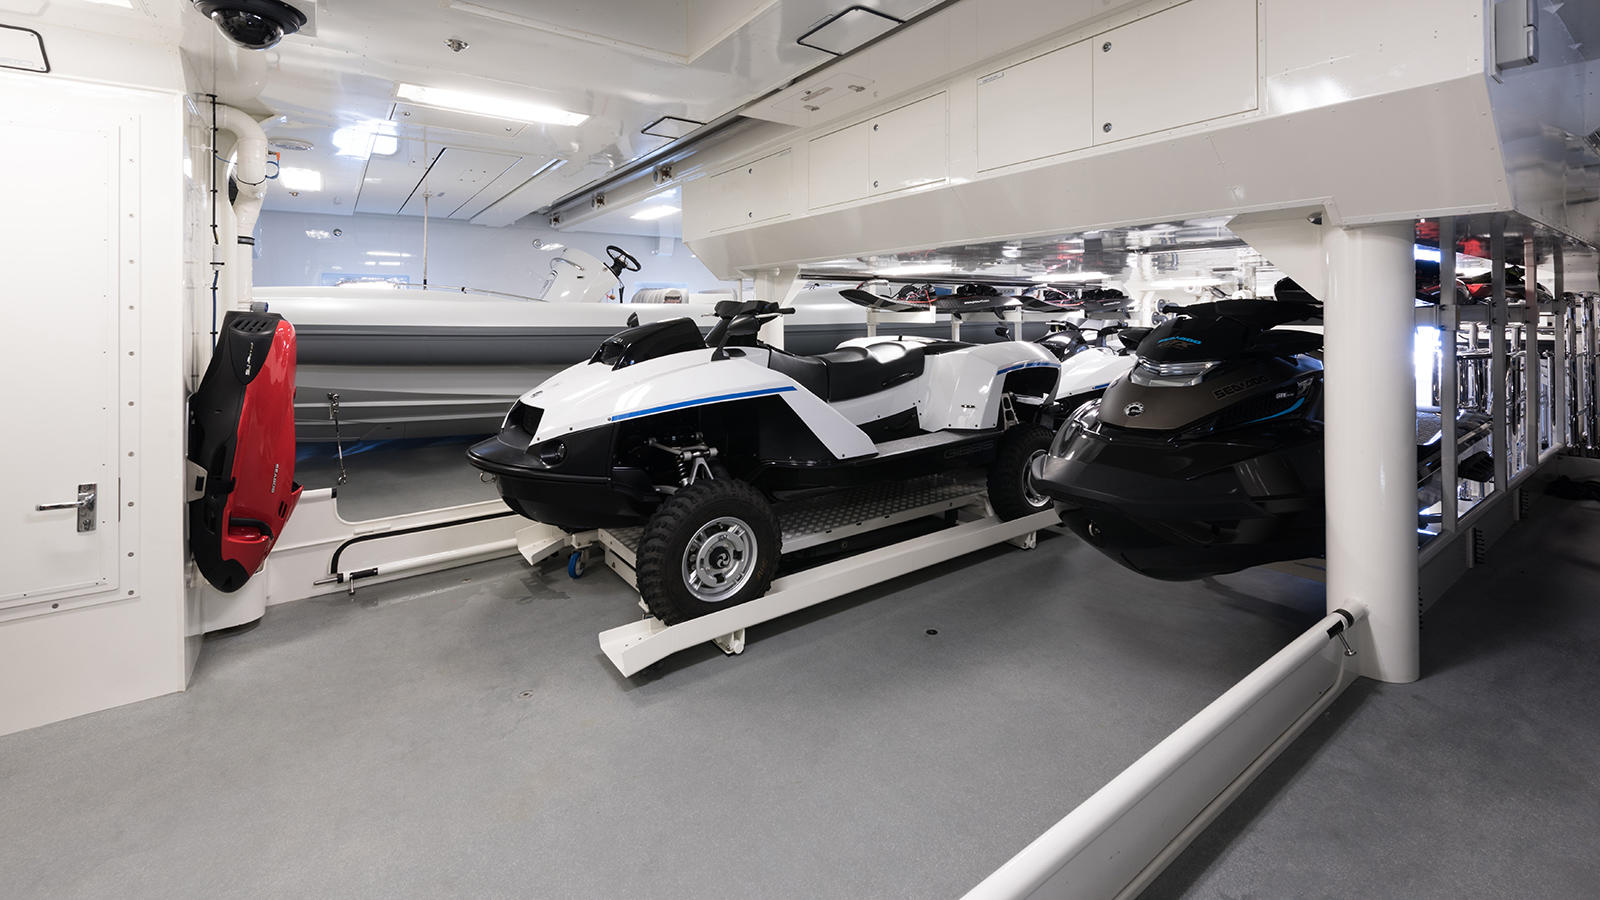 hsIArI5RWScBhFSSHT1e_Plvs-Vltra-Amels-LE242-yacht-water-toy-storage-credit-Jeff-Brown-1600x900